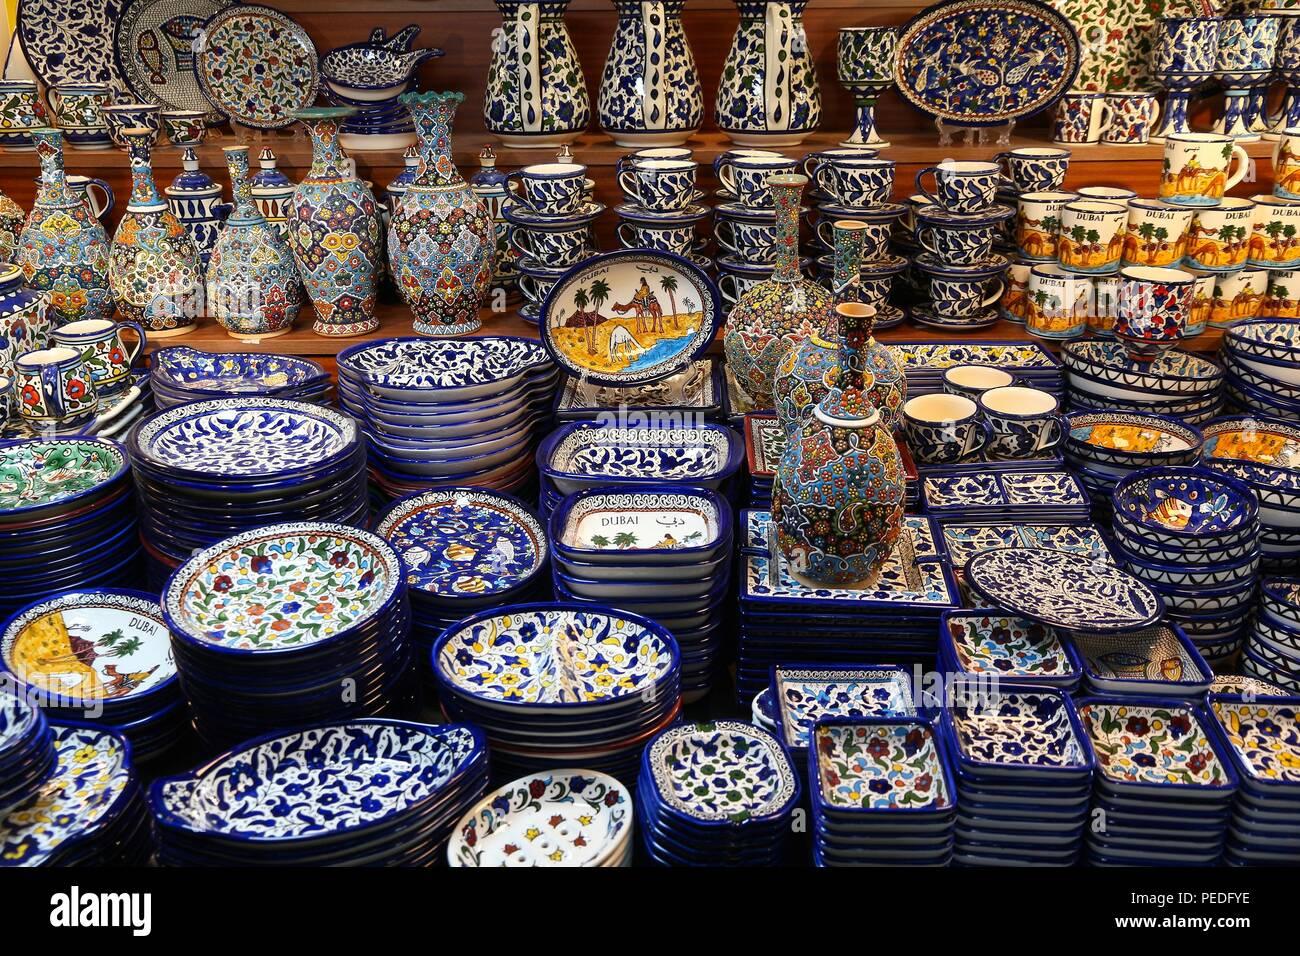 DUBAI, UAE - NOVEMBER 23, 2017: Traditional Arabic style ceramics at